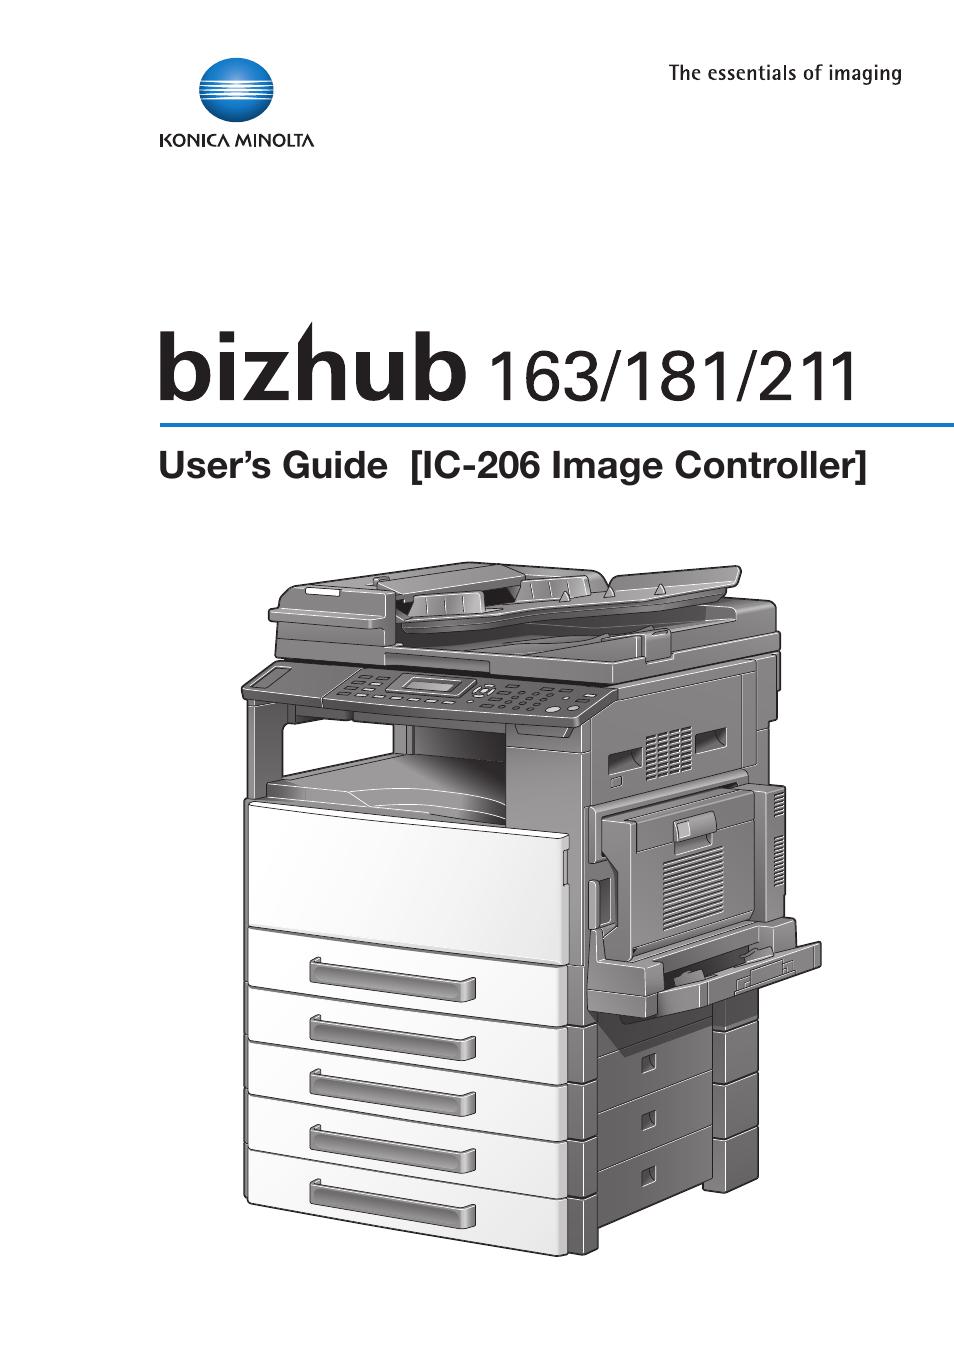 konica minolta bizhub 163 user manual 362 pages also for bizhub rh manualsdir com konica minolta bizhub 163 manual konica minolta bizhub 163 manual download